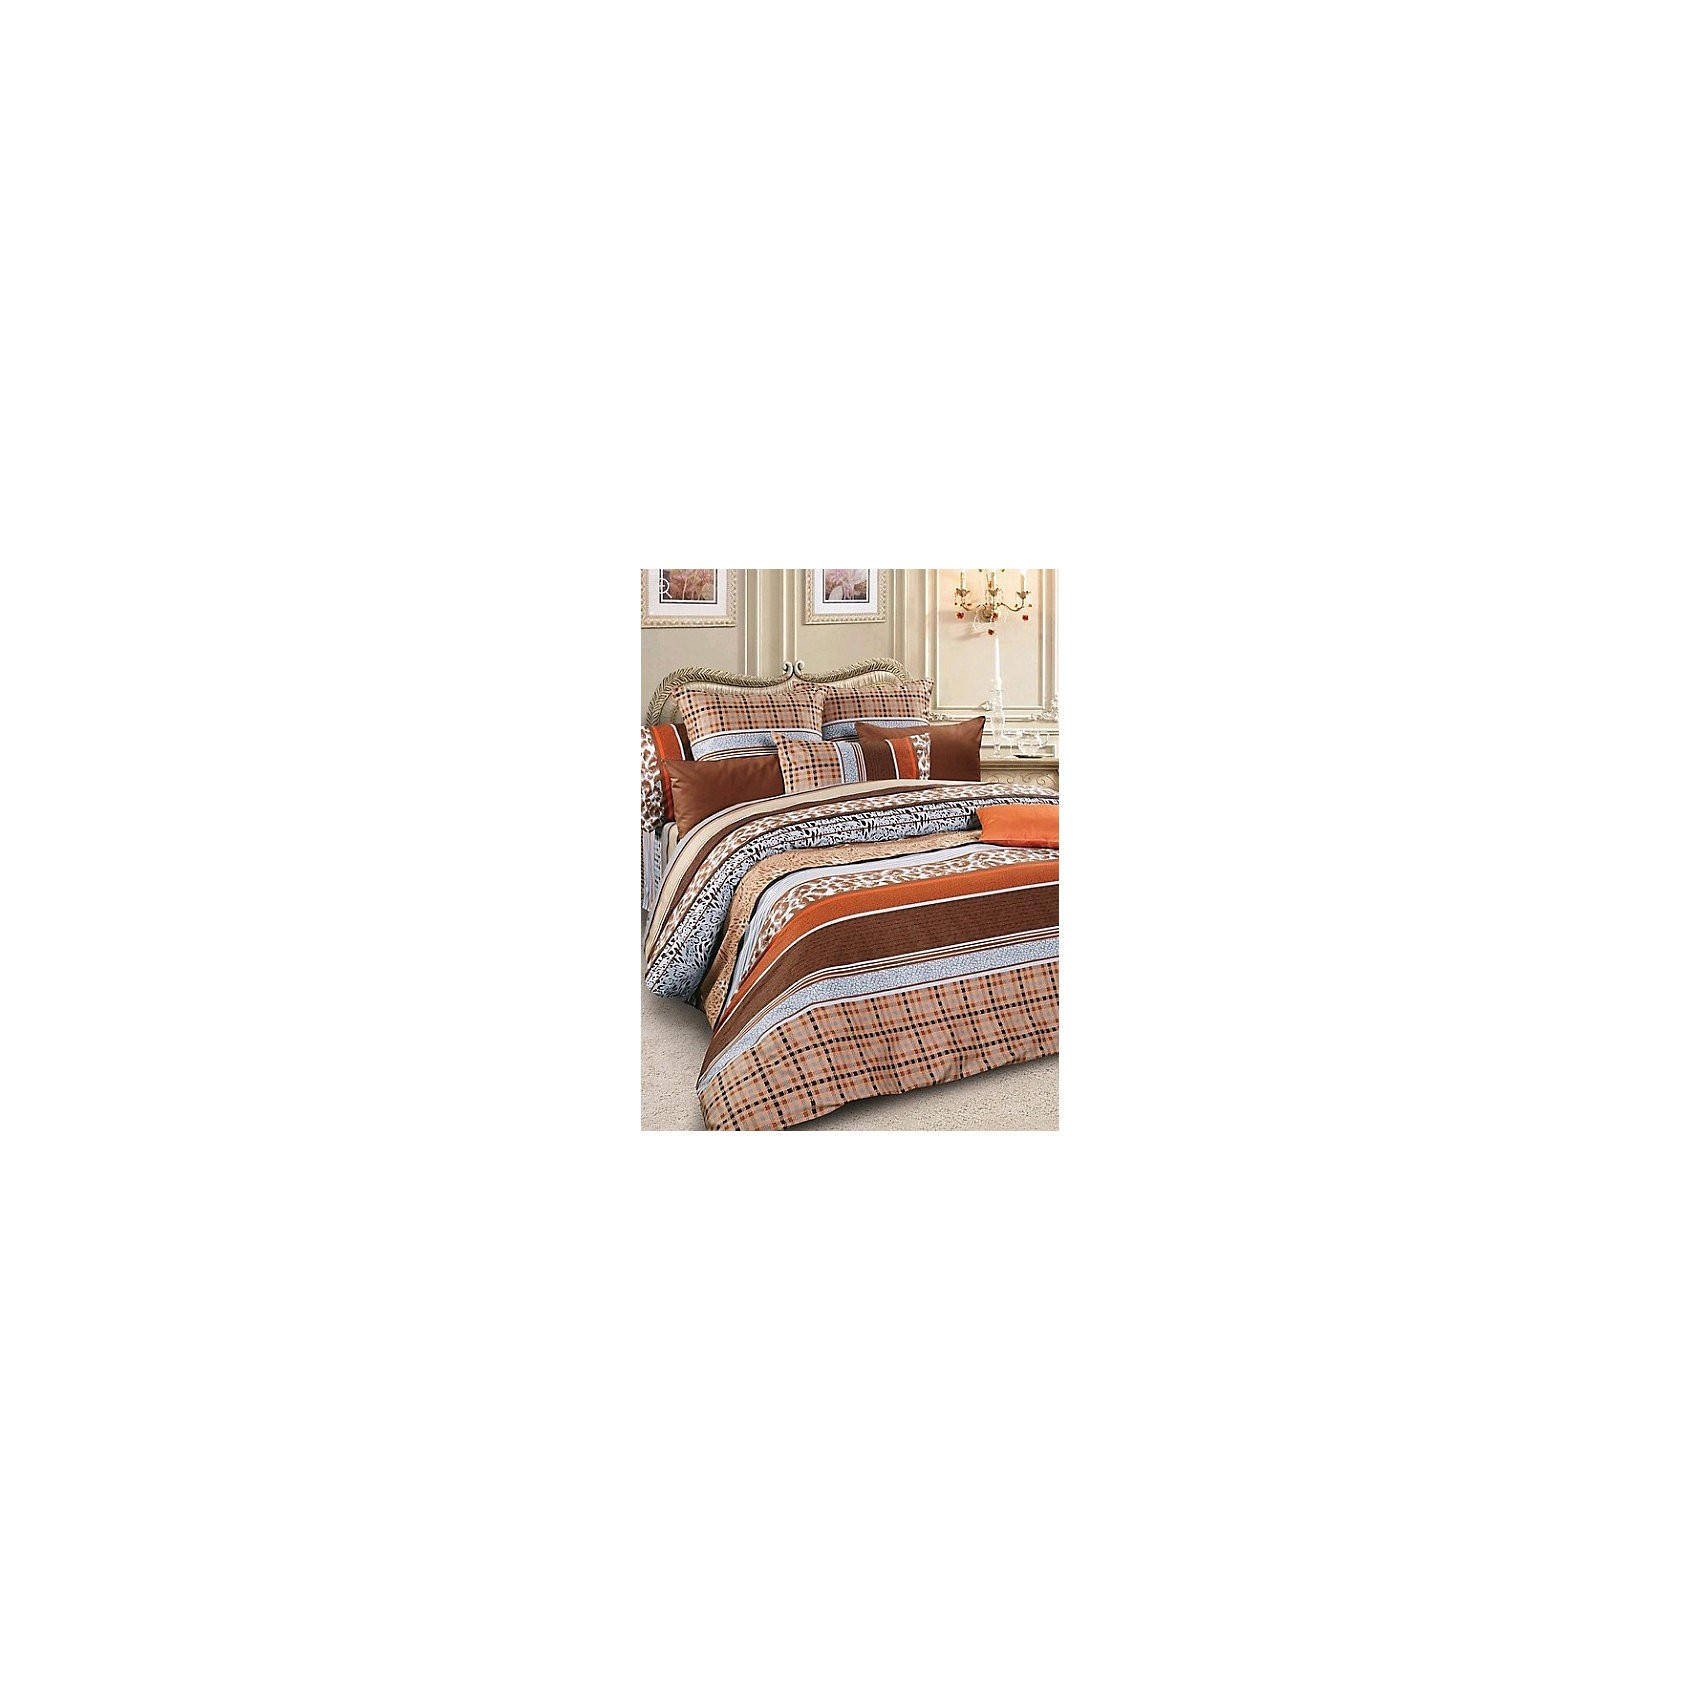 Letto Постельное белье Евро SM56 сатин, (нав.70х70), Letto комплект белья letto дуэт семейный наволочки 70х70 цвет голубой b33 7